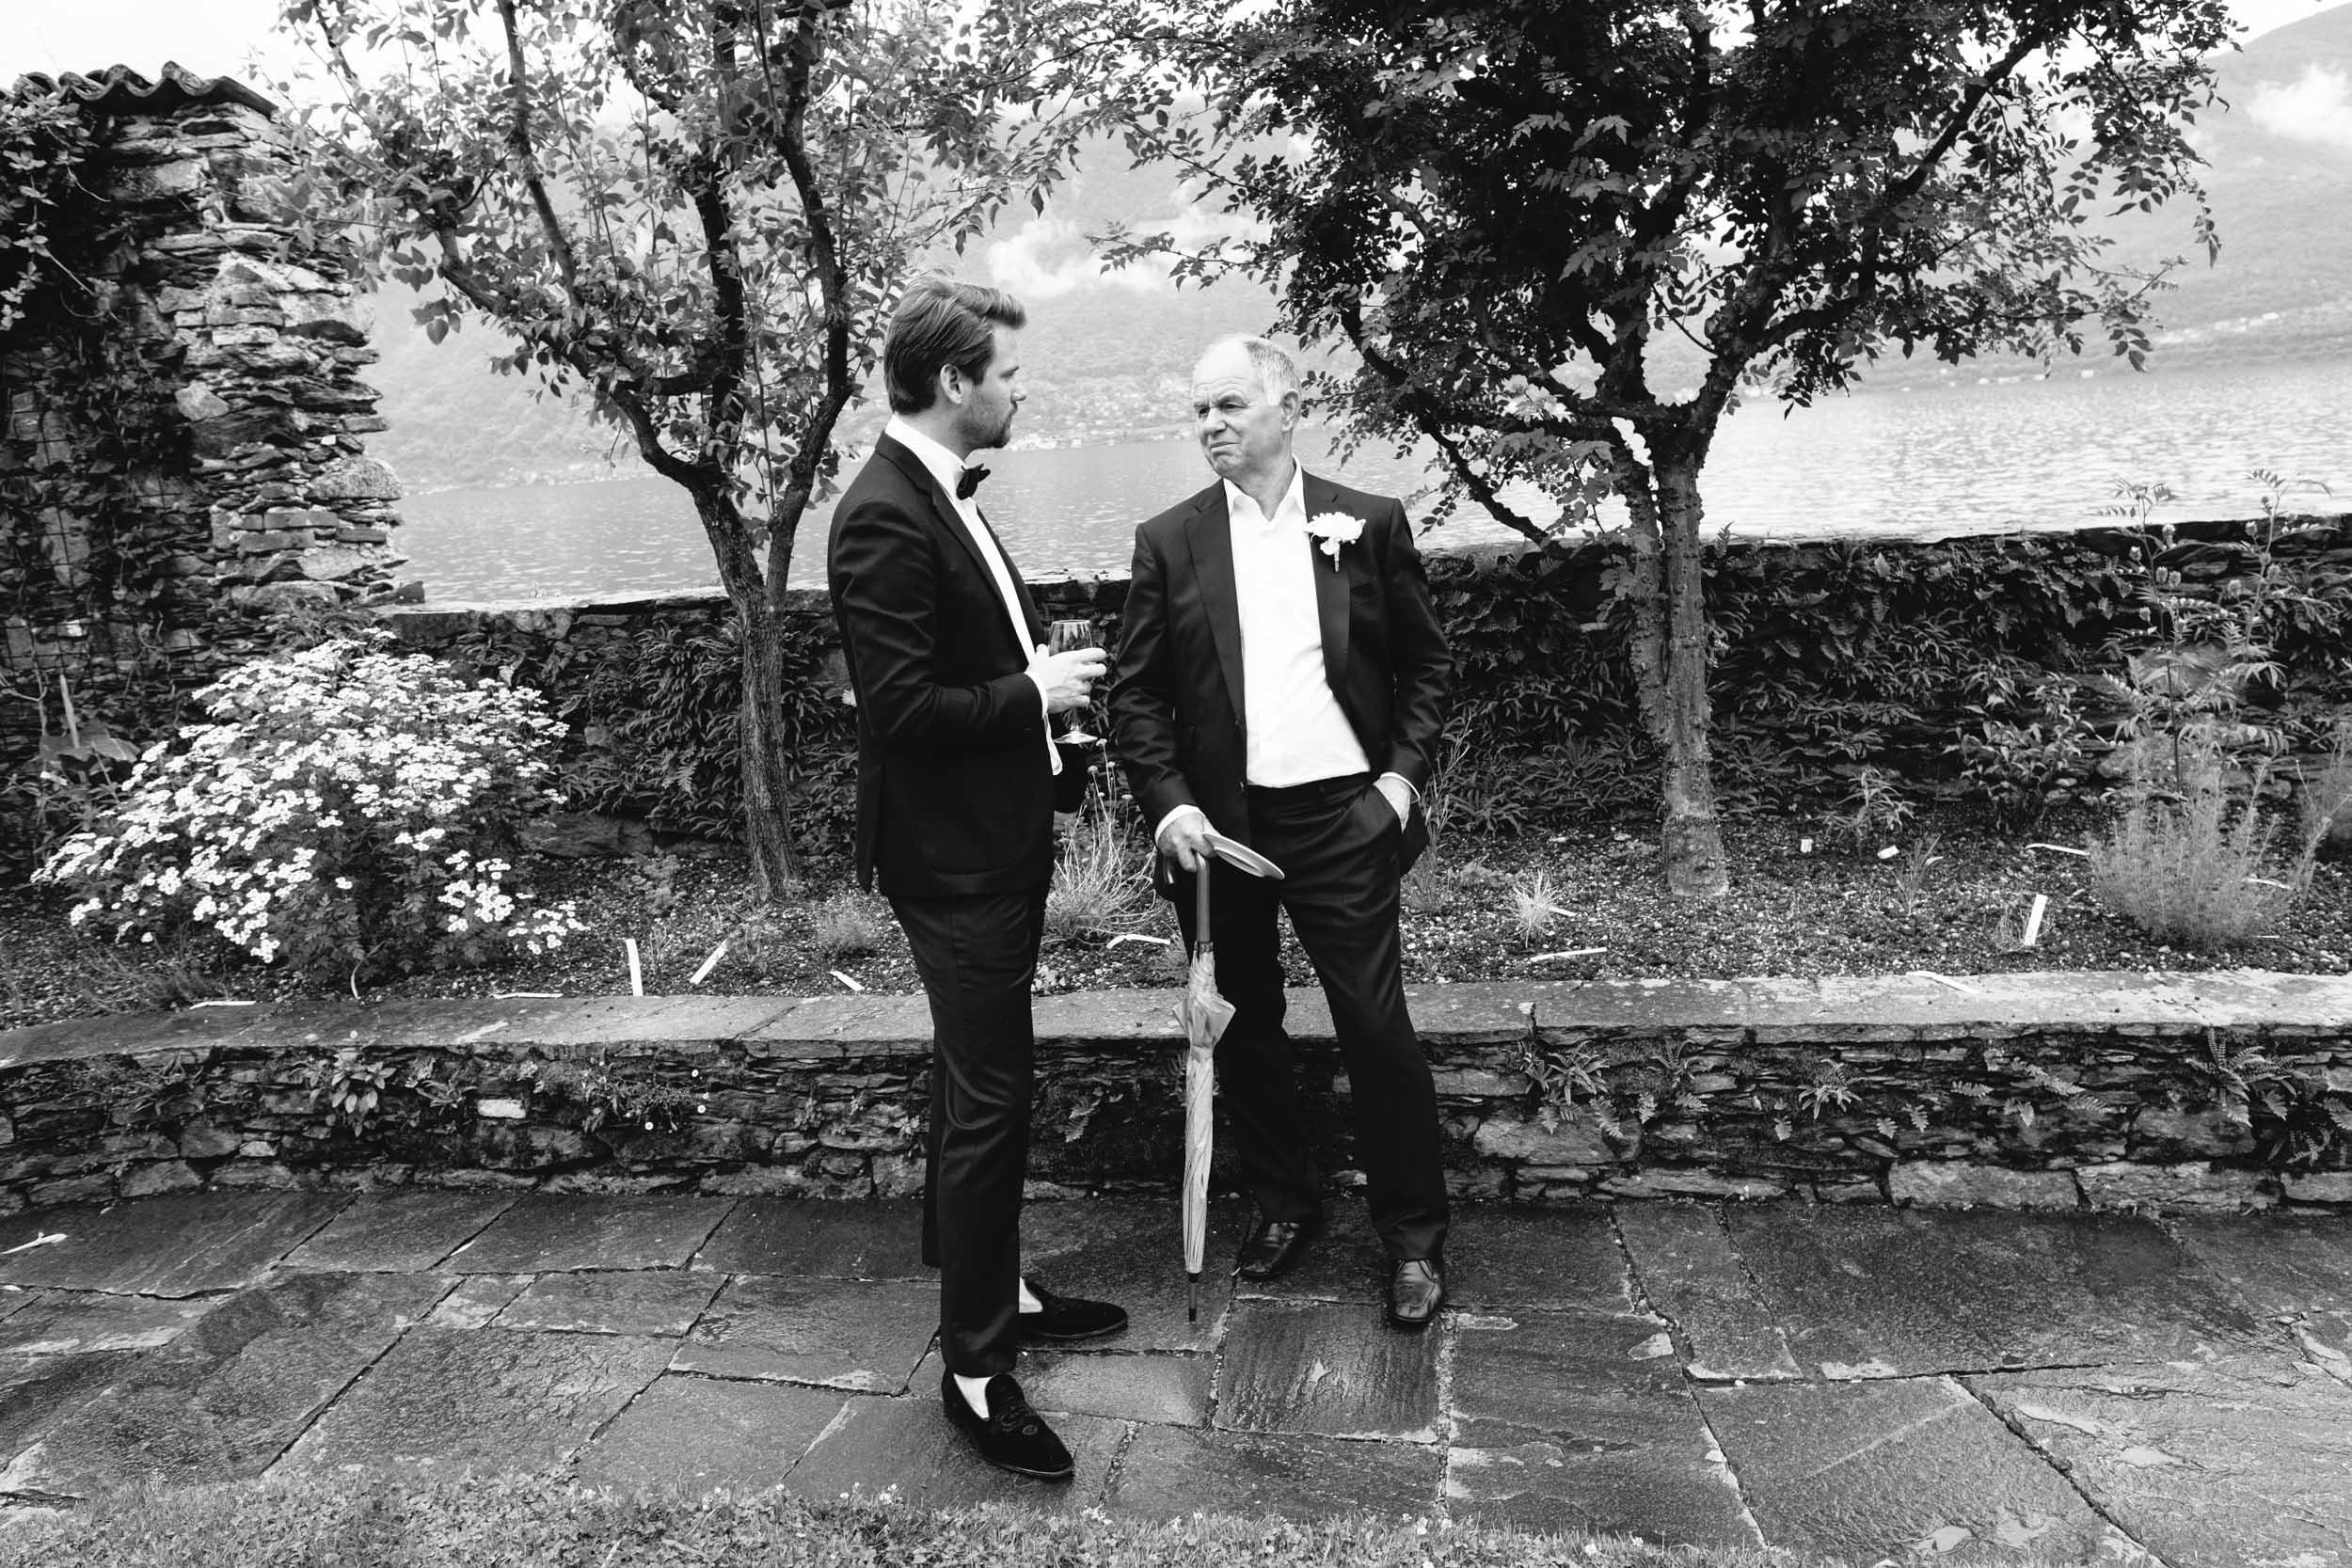 olivia-andreas-wedding-switzerland-254.jpg